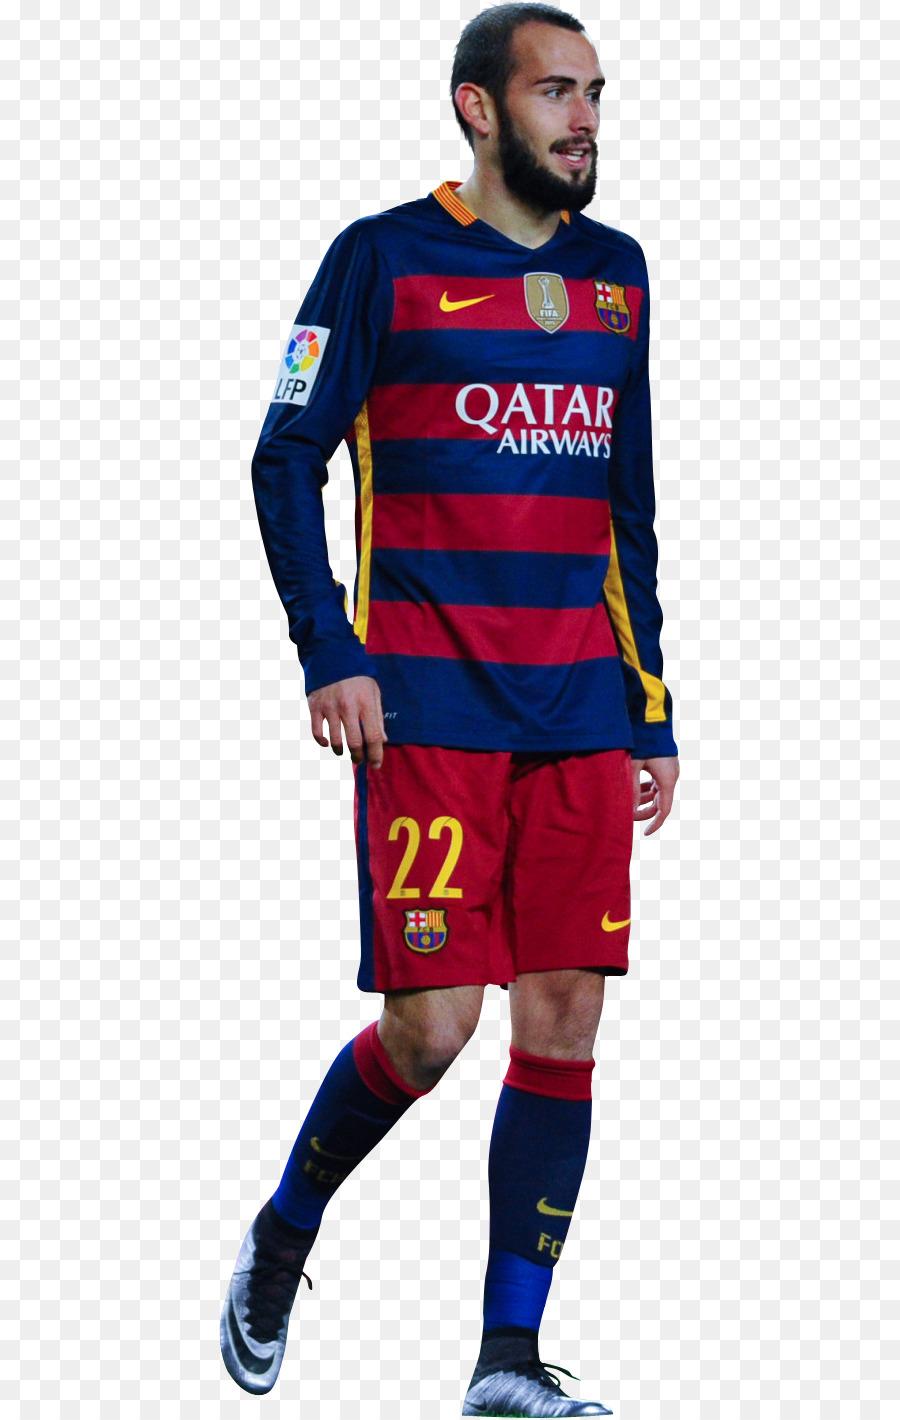 new product e5b15 98d8e fc barcelona player jersey